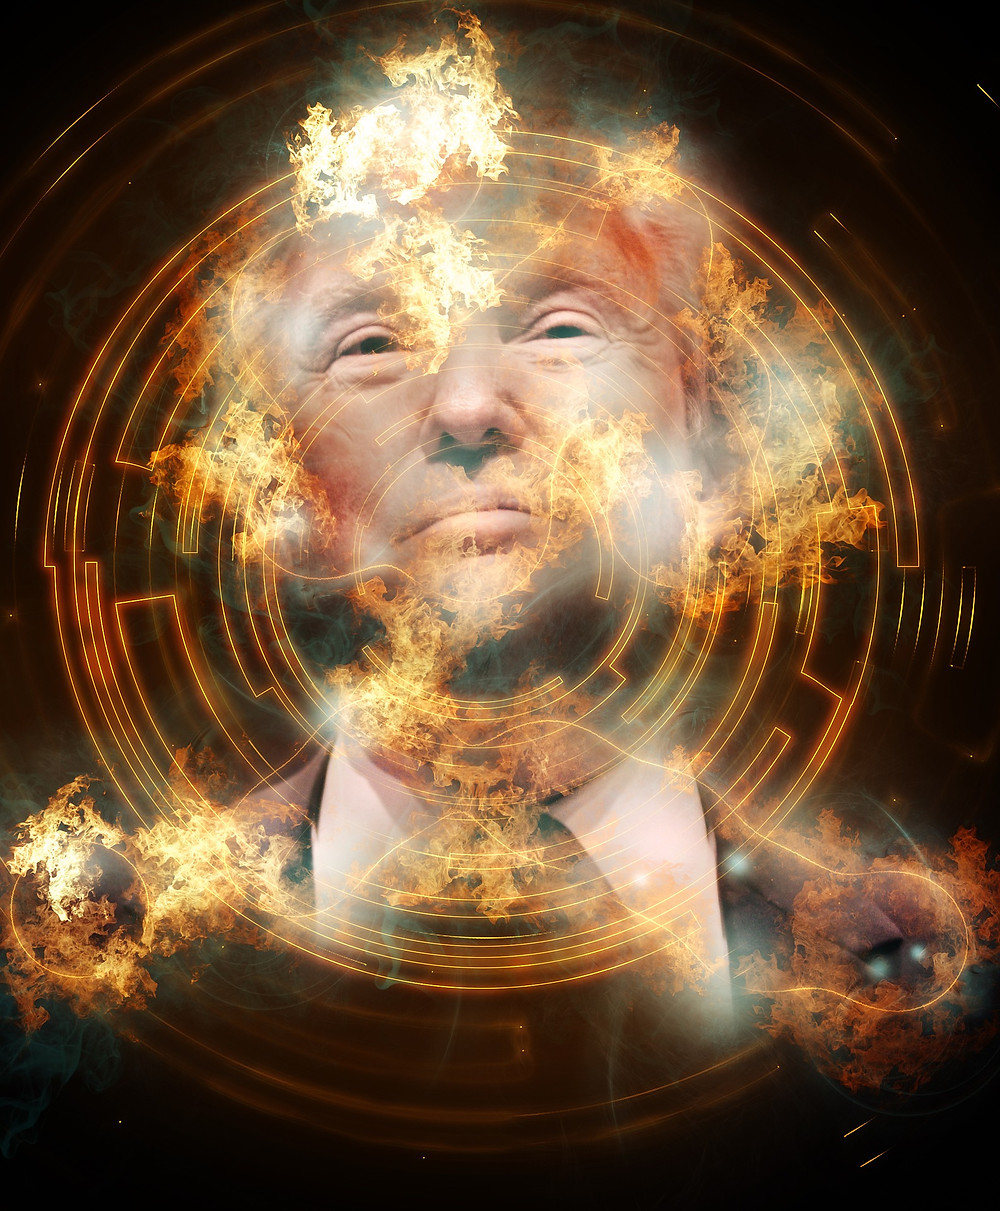 Trump puts everything in turmoil